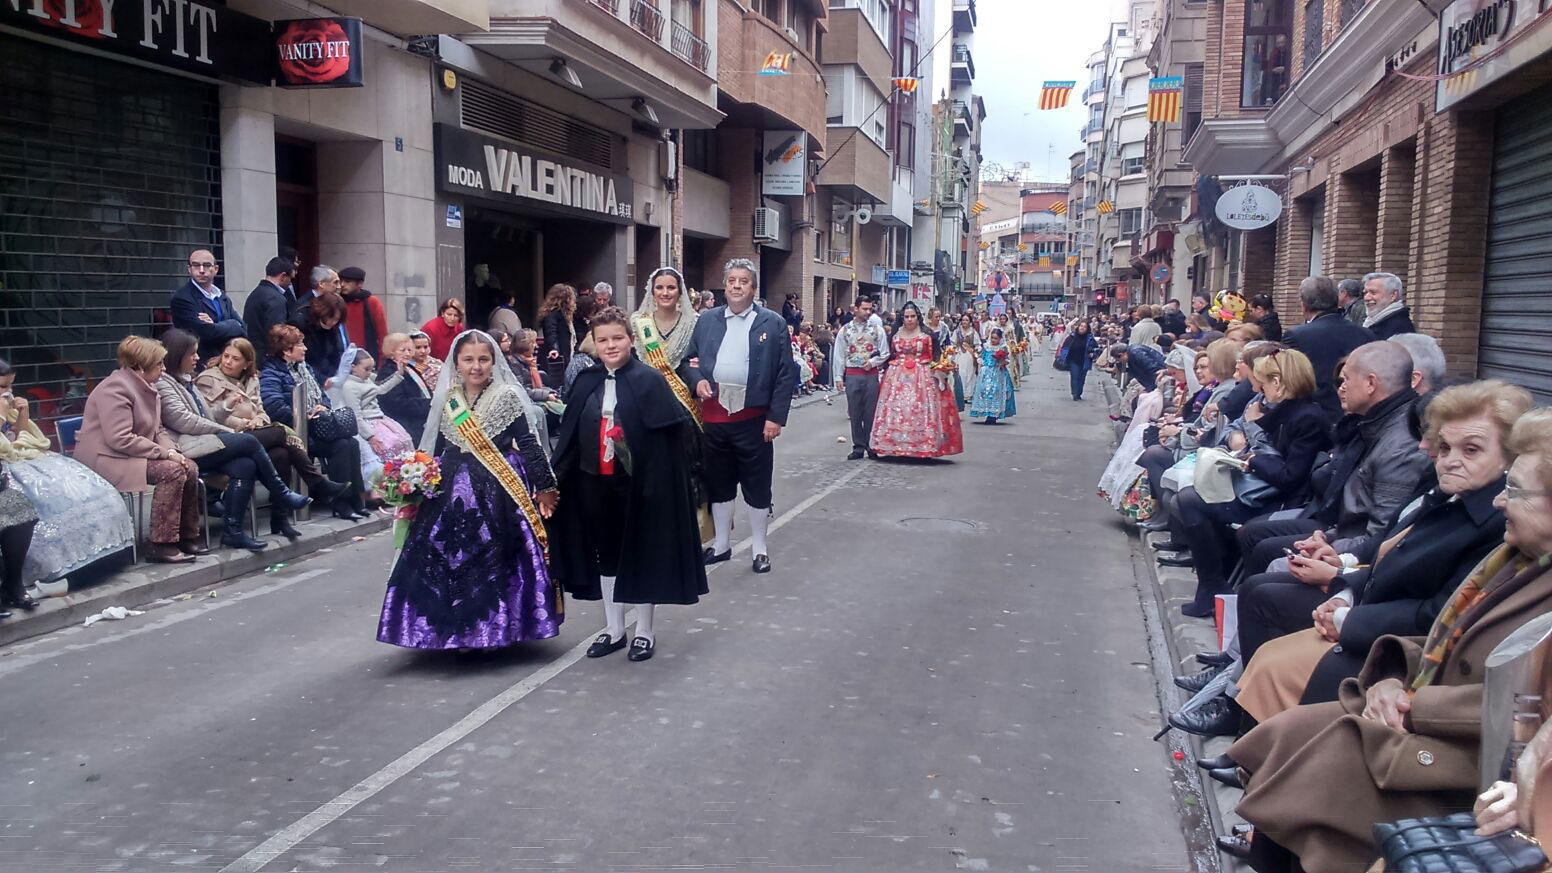 160319-ofrenda-crema-burriana-6003